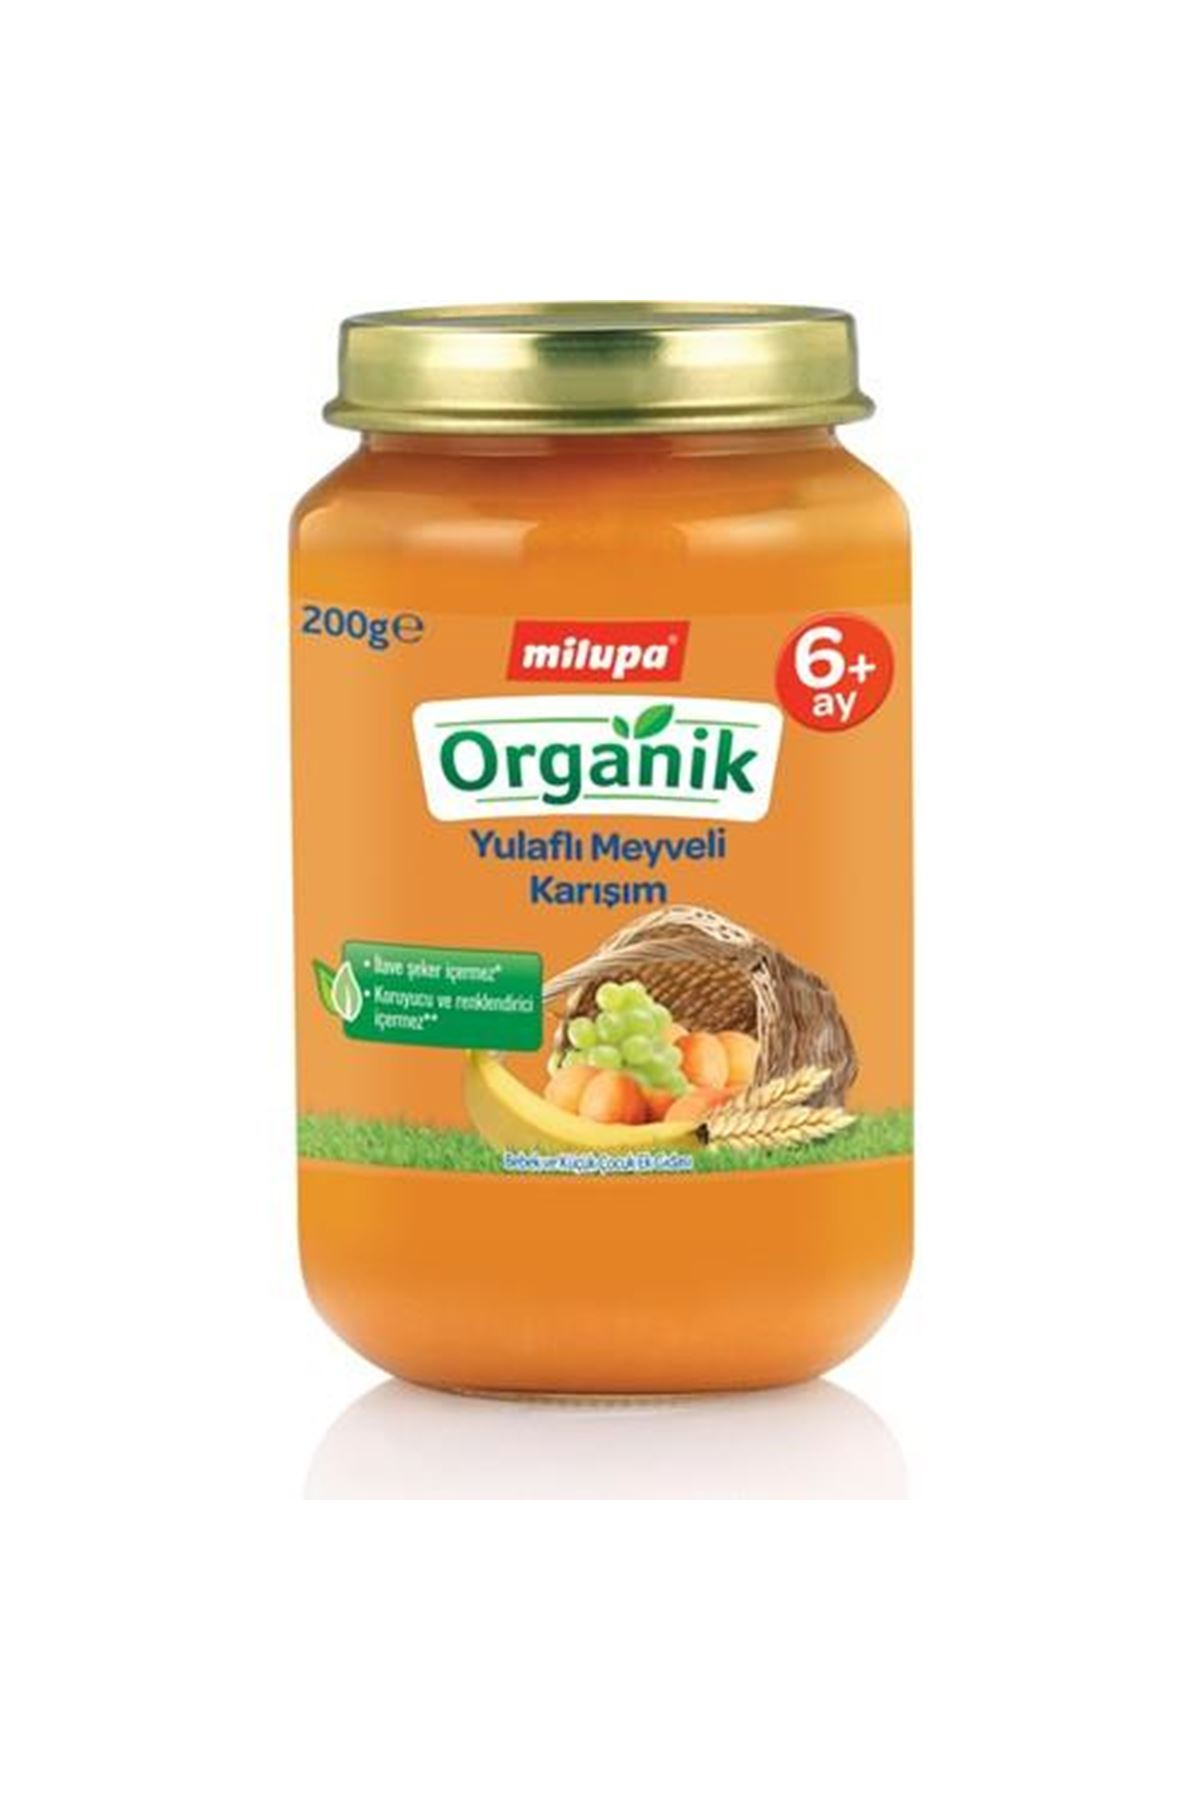 Milupa Organik Yulaflı Meyveli Karışım Kavanoz Maması 200 Gr